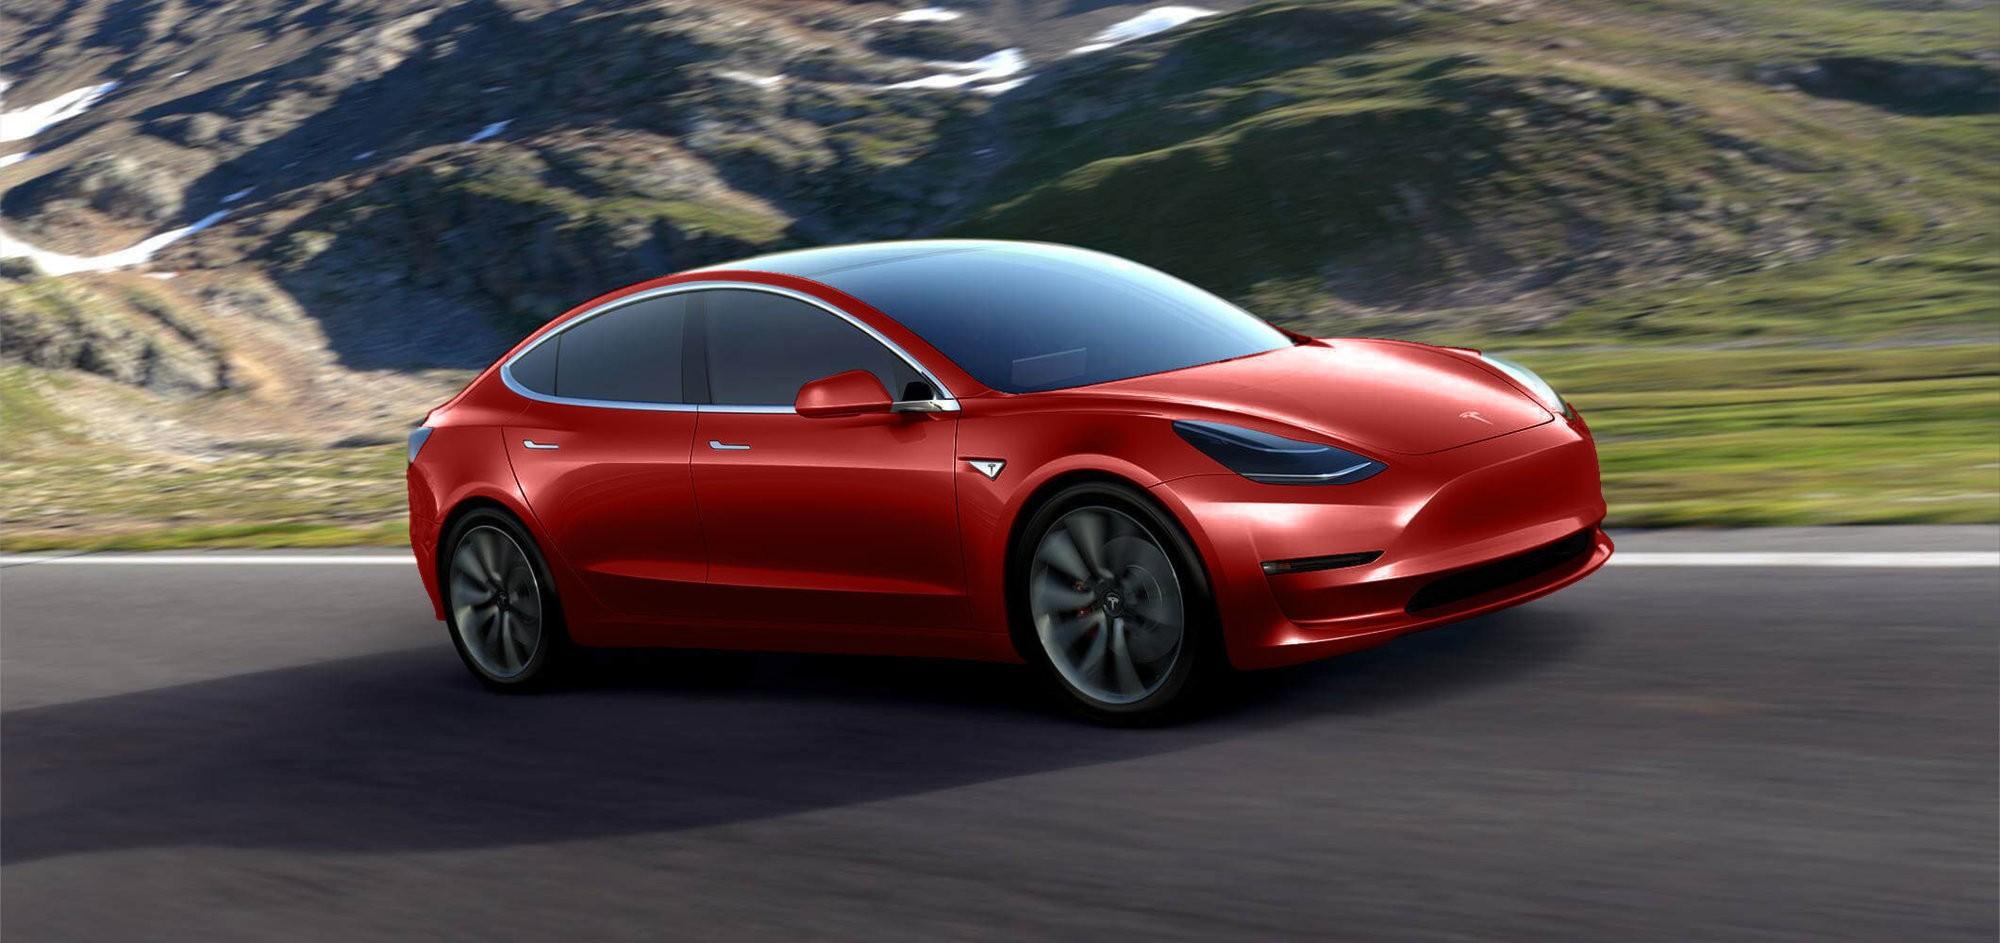 Tesla Model 3 Gets Rendered In Dozens Of Colors Looks